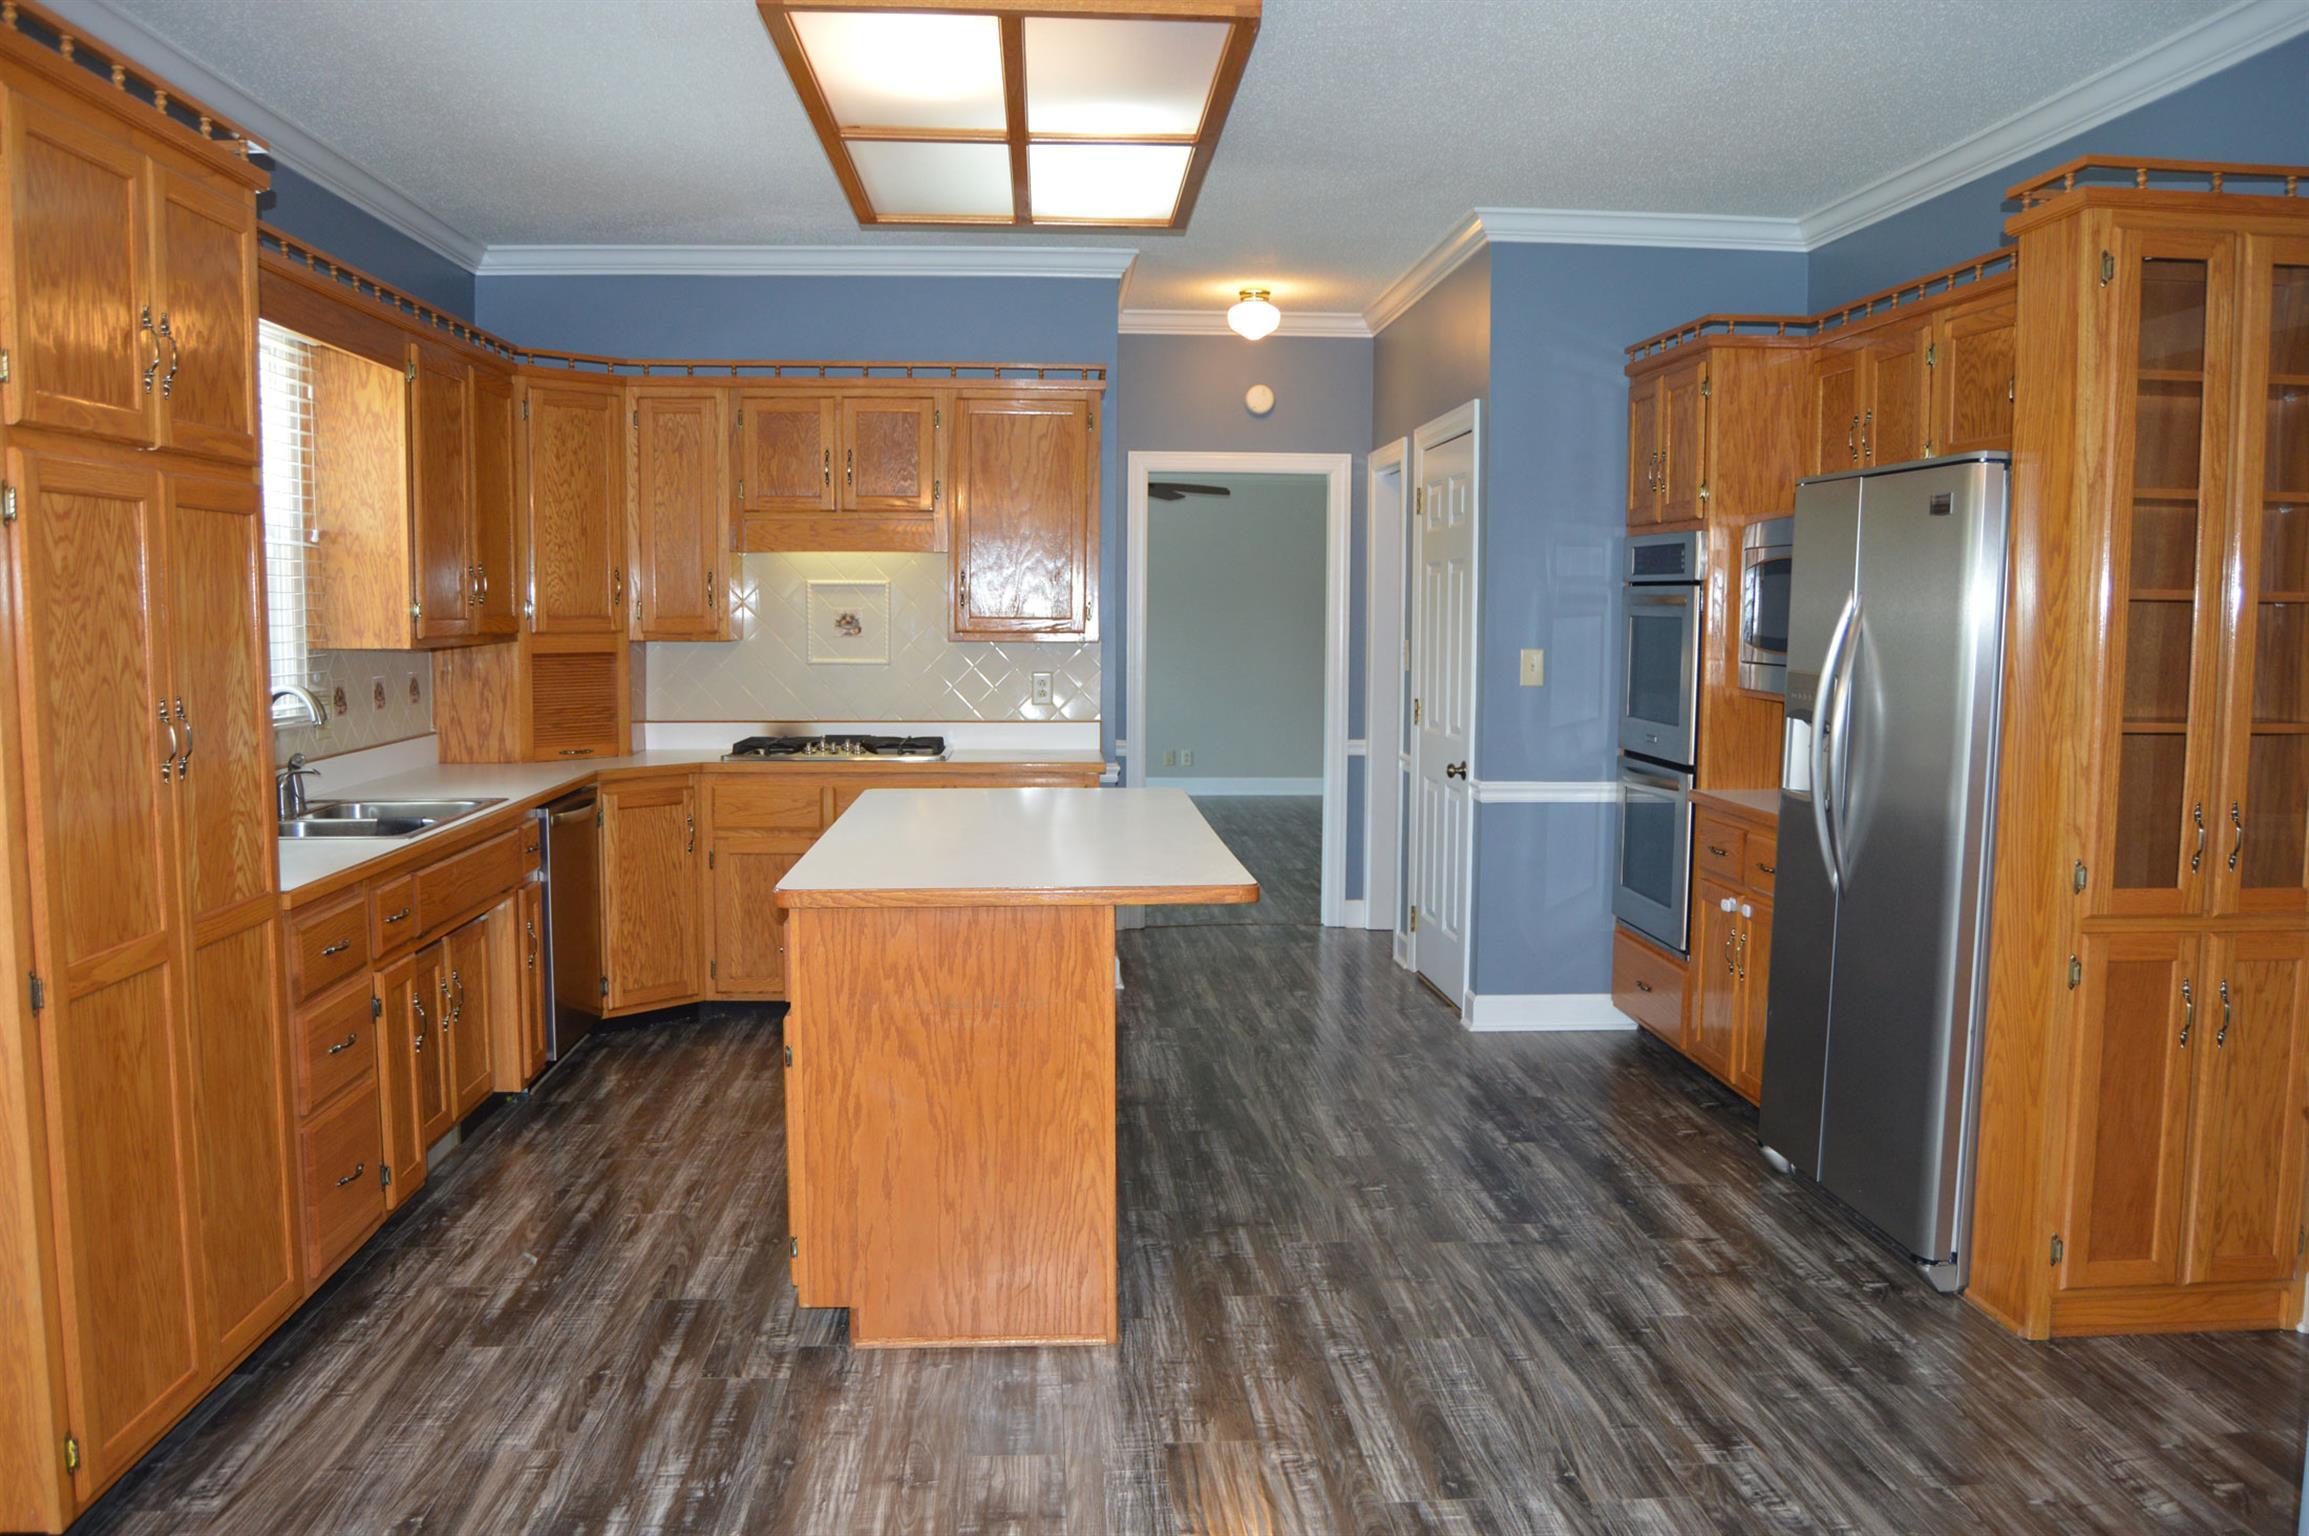 507 POND APPLE ROAD, Clarksville, TN 37043 - Clarksville, TN real estate listing